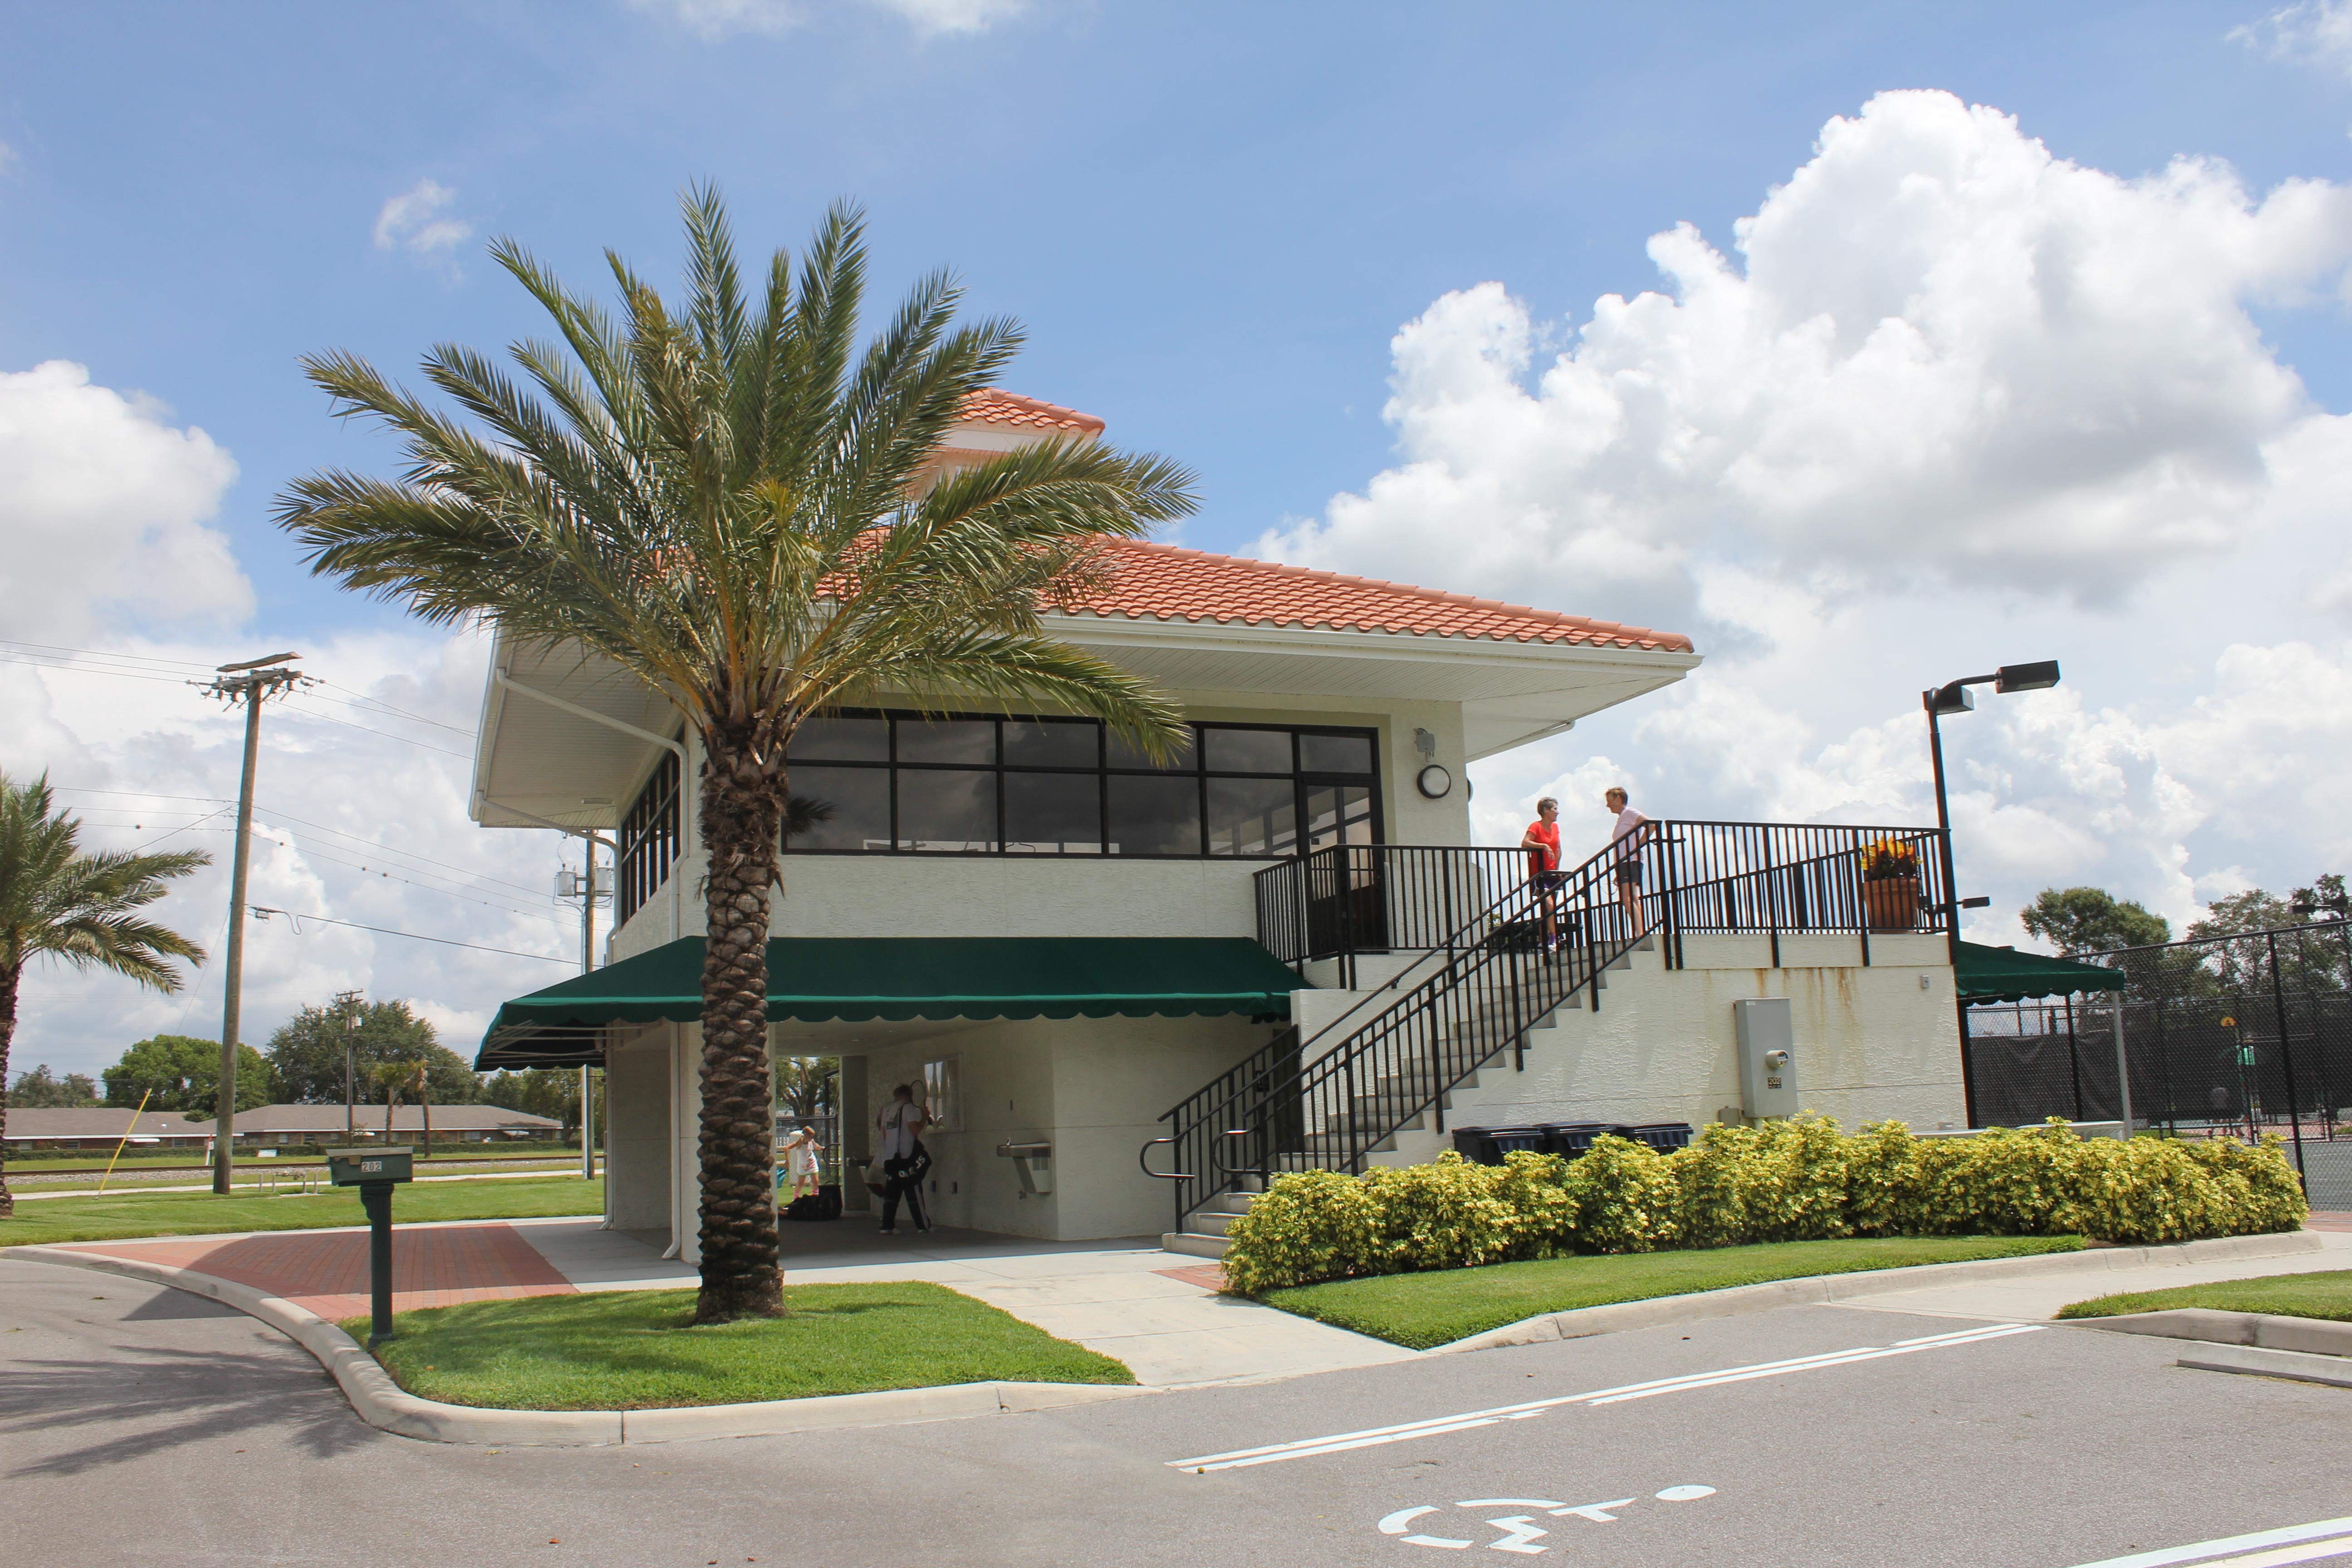 The outside of the Auburndale Tennis Center